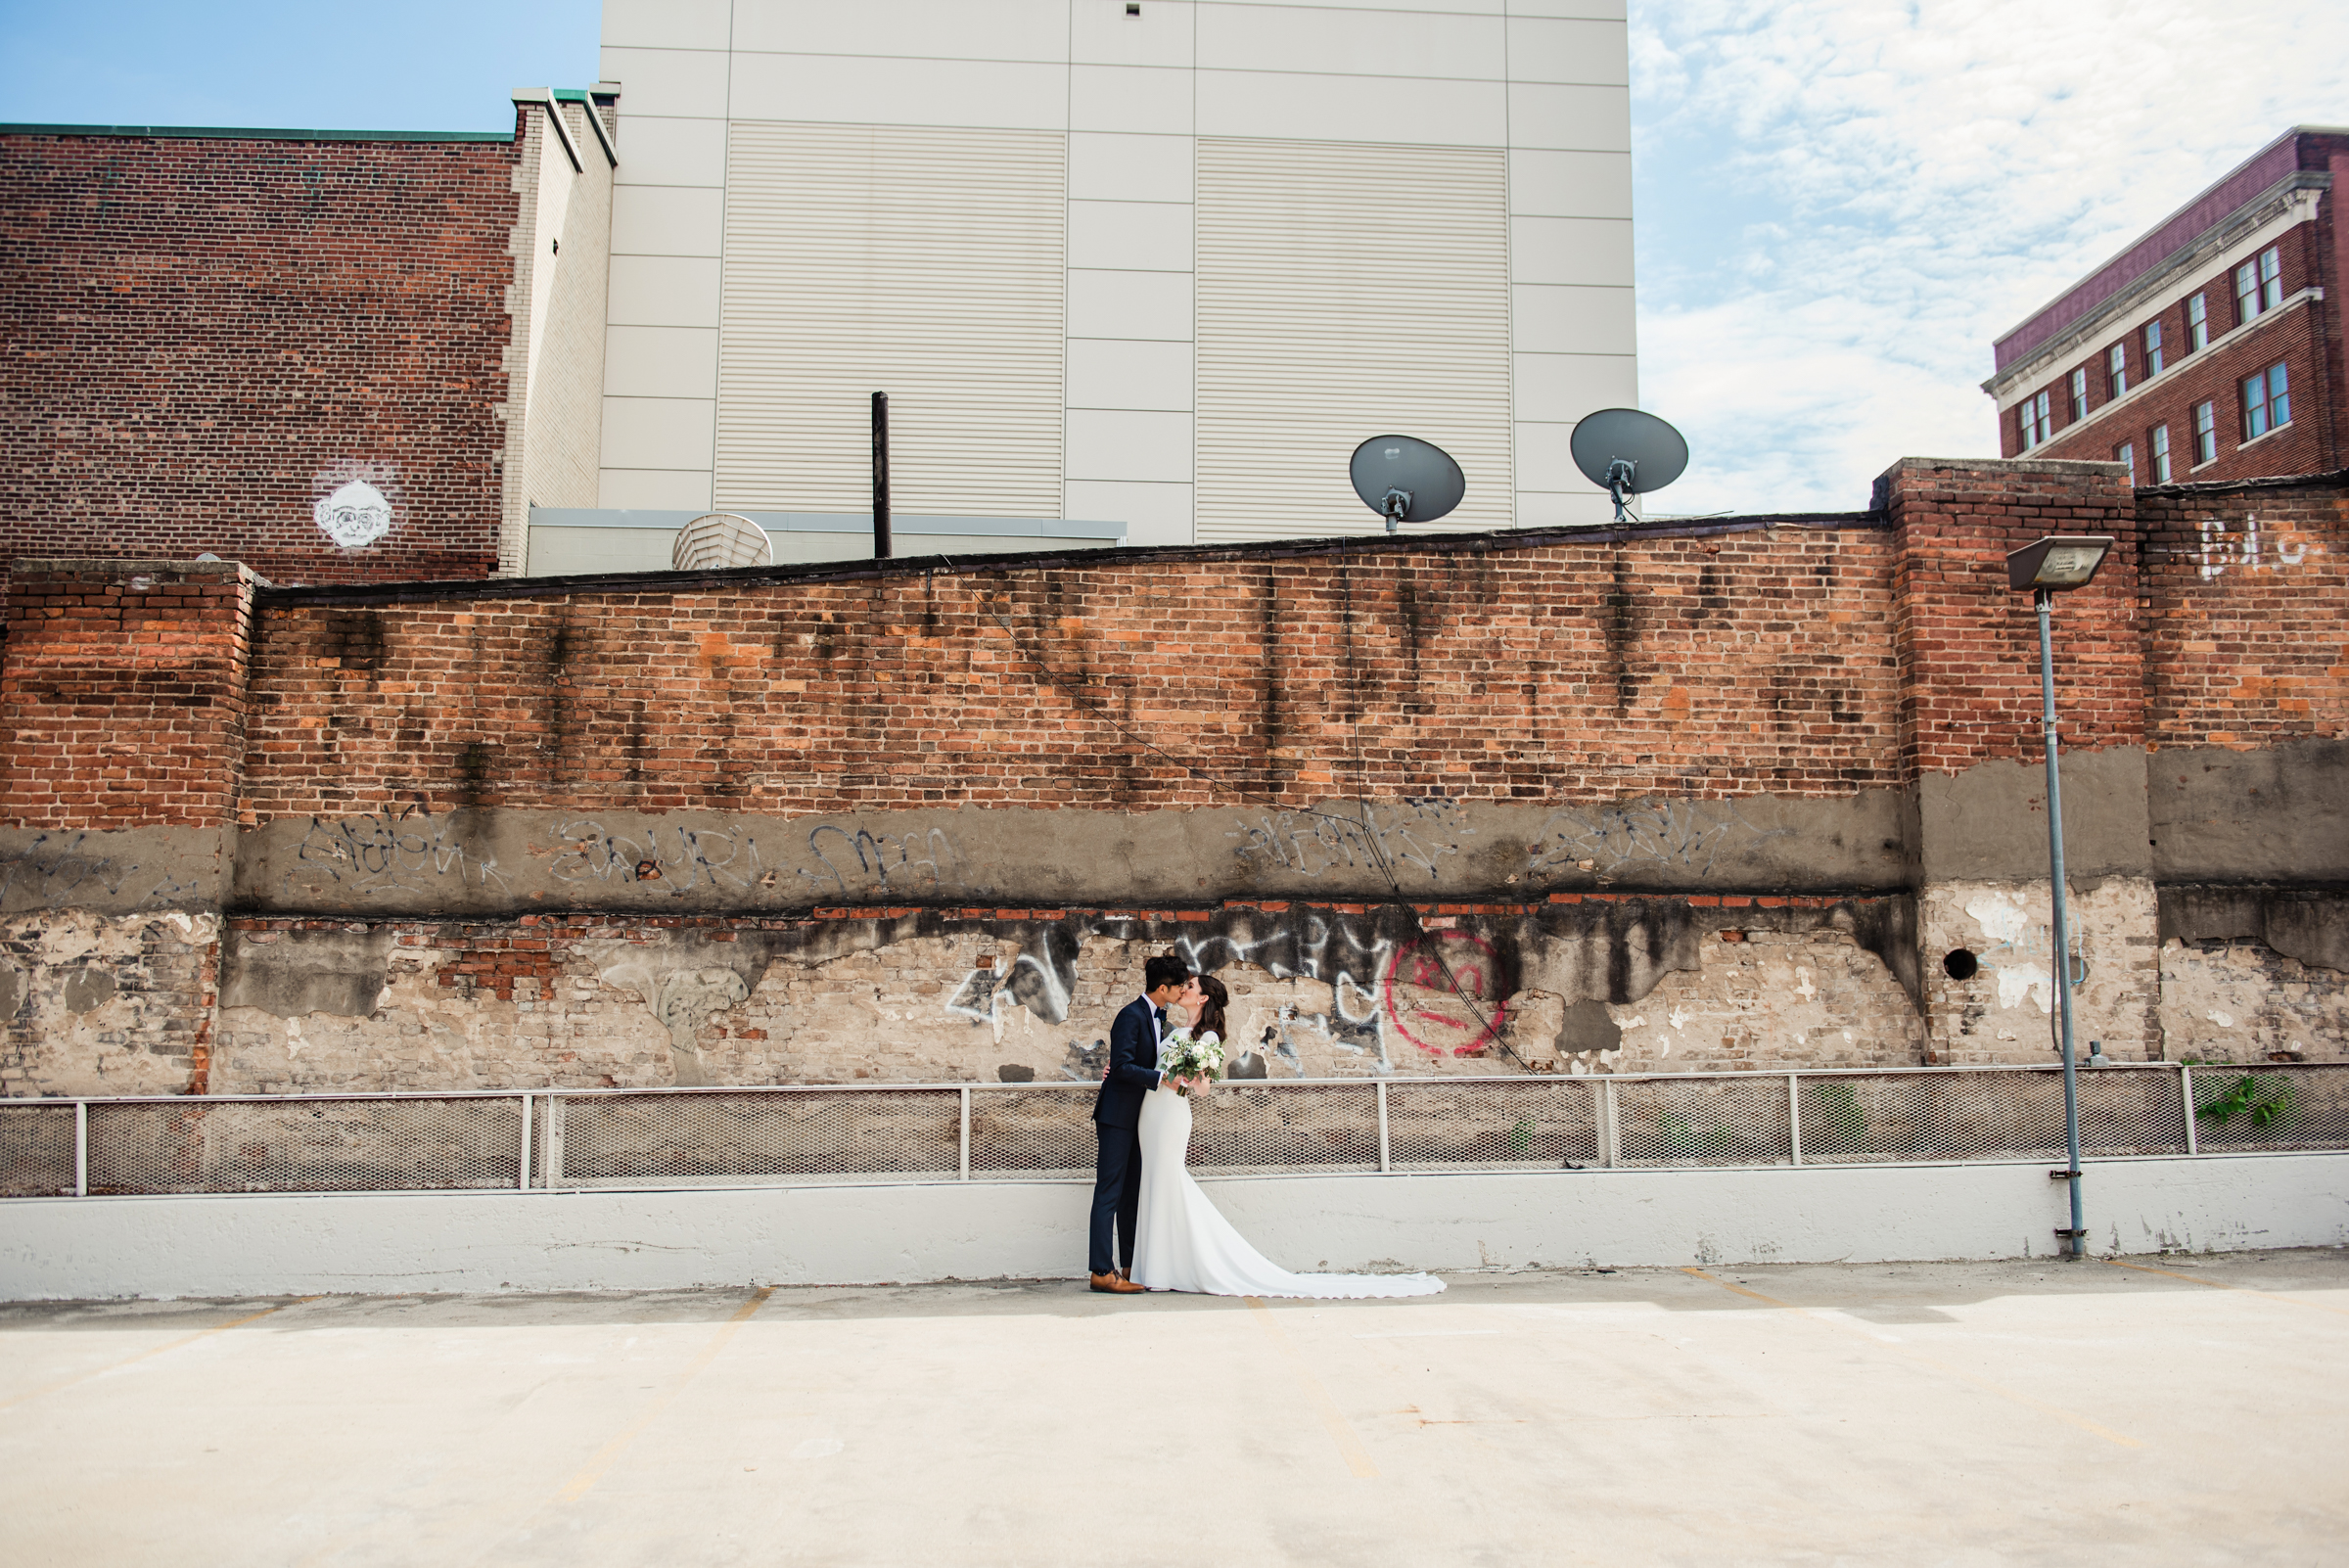 SKY_Armory_Syracuse_Wedding_JILL_STUDIO_Rochester_NY_Photographer_DSC_5241.jpg